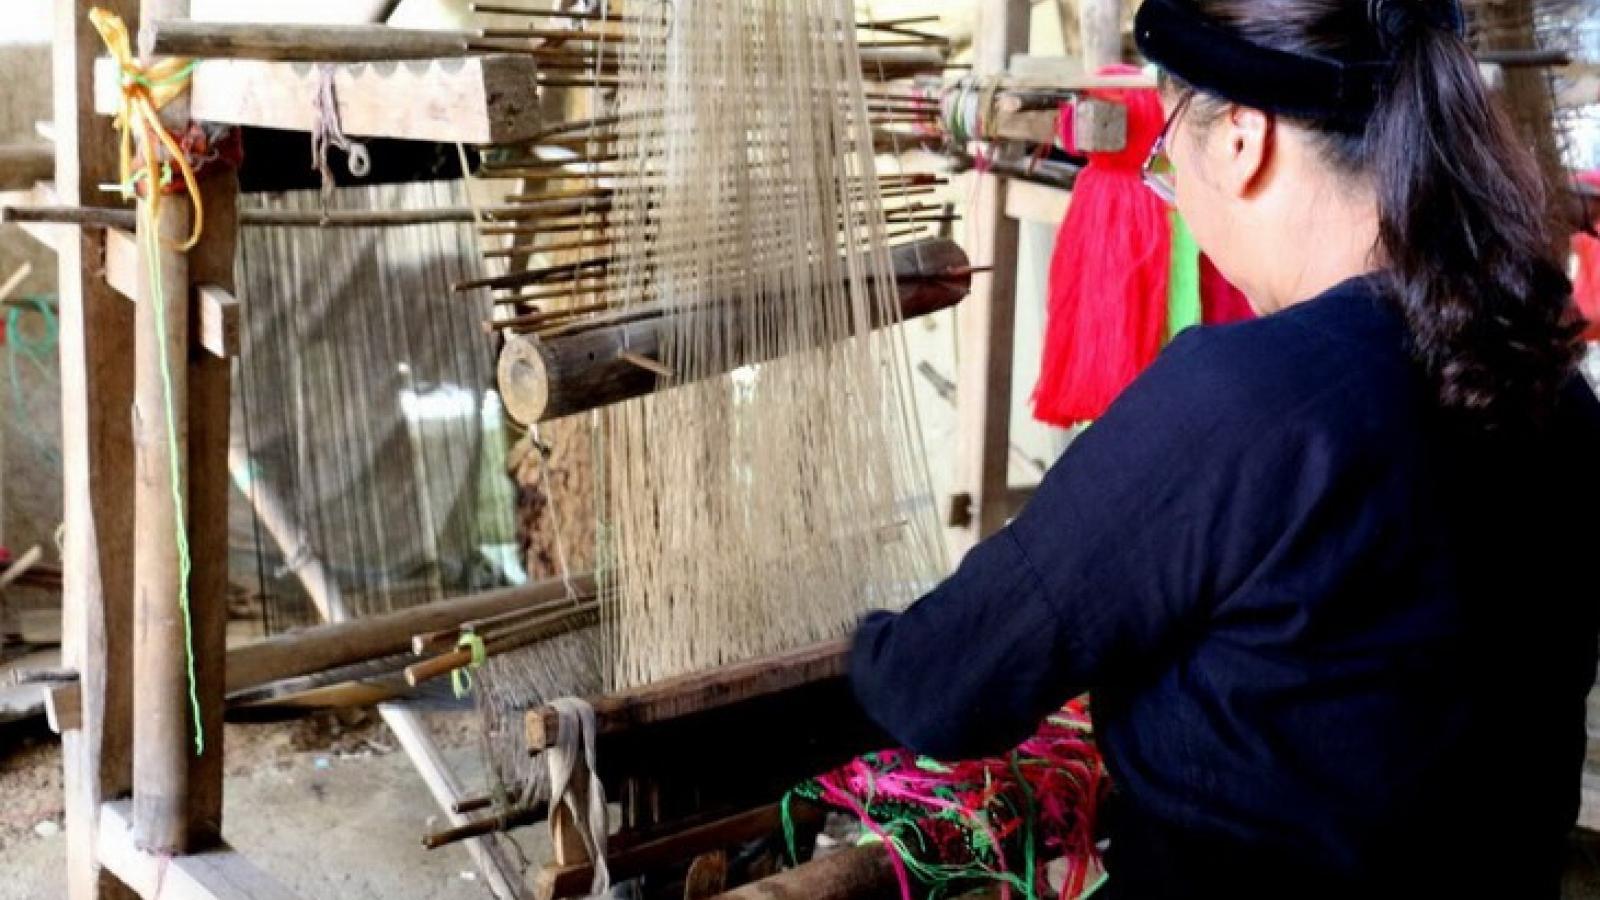 Weaving – traditional craft of Tay ethnic minority